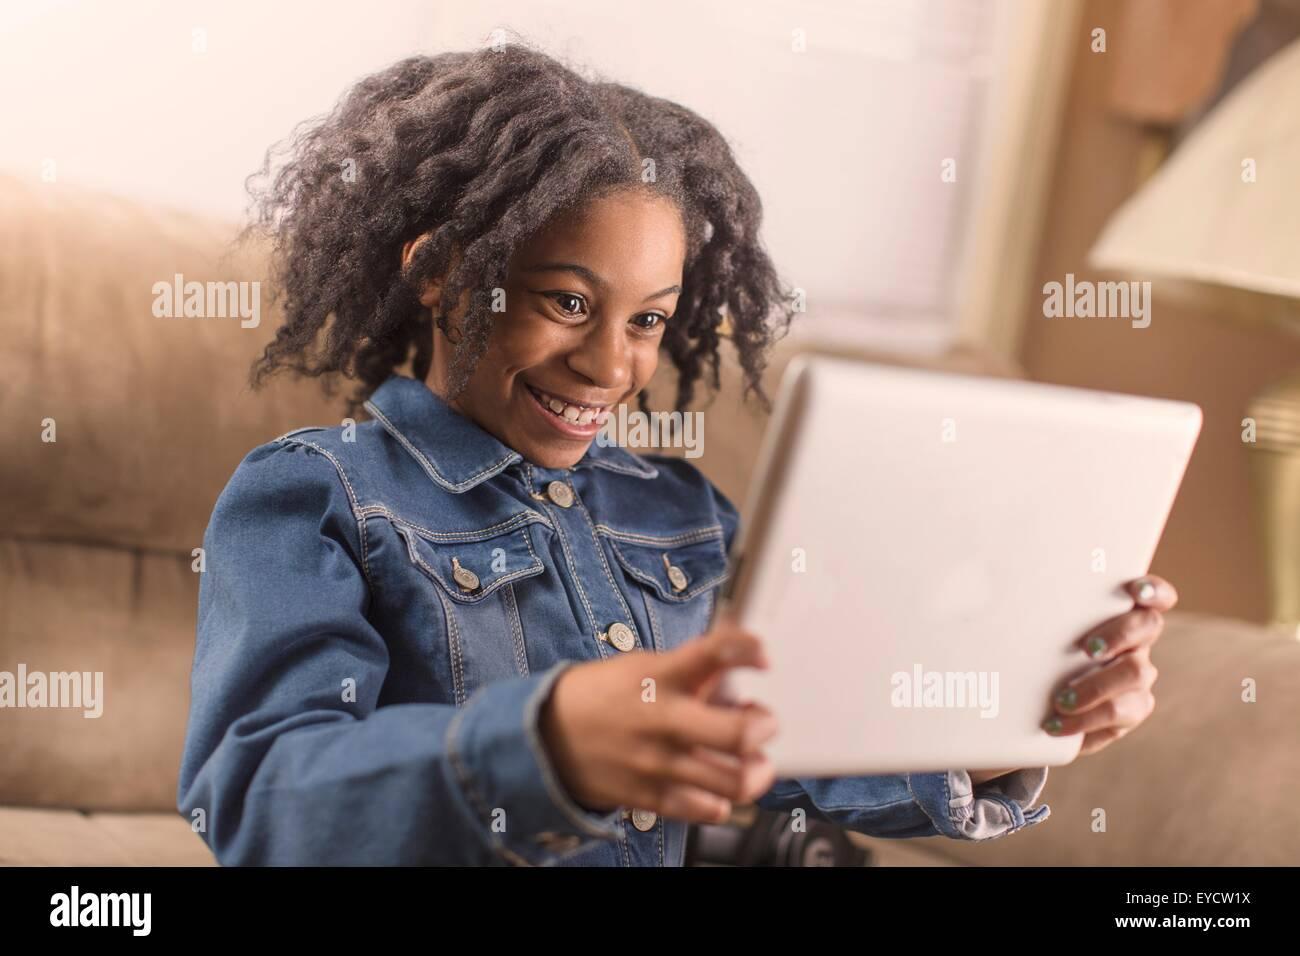 Cute girl posing for digital tablet selfie on sofa Stock Photo